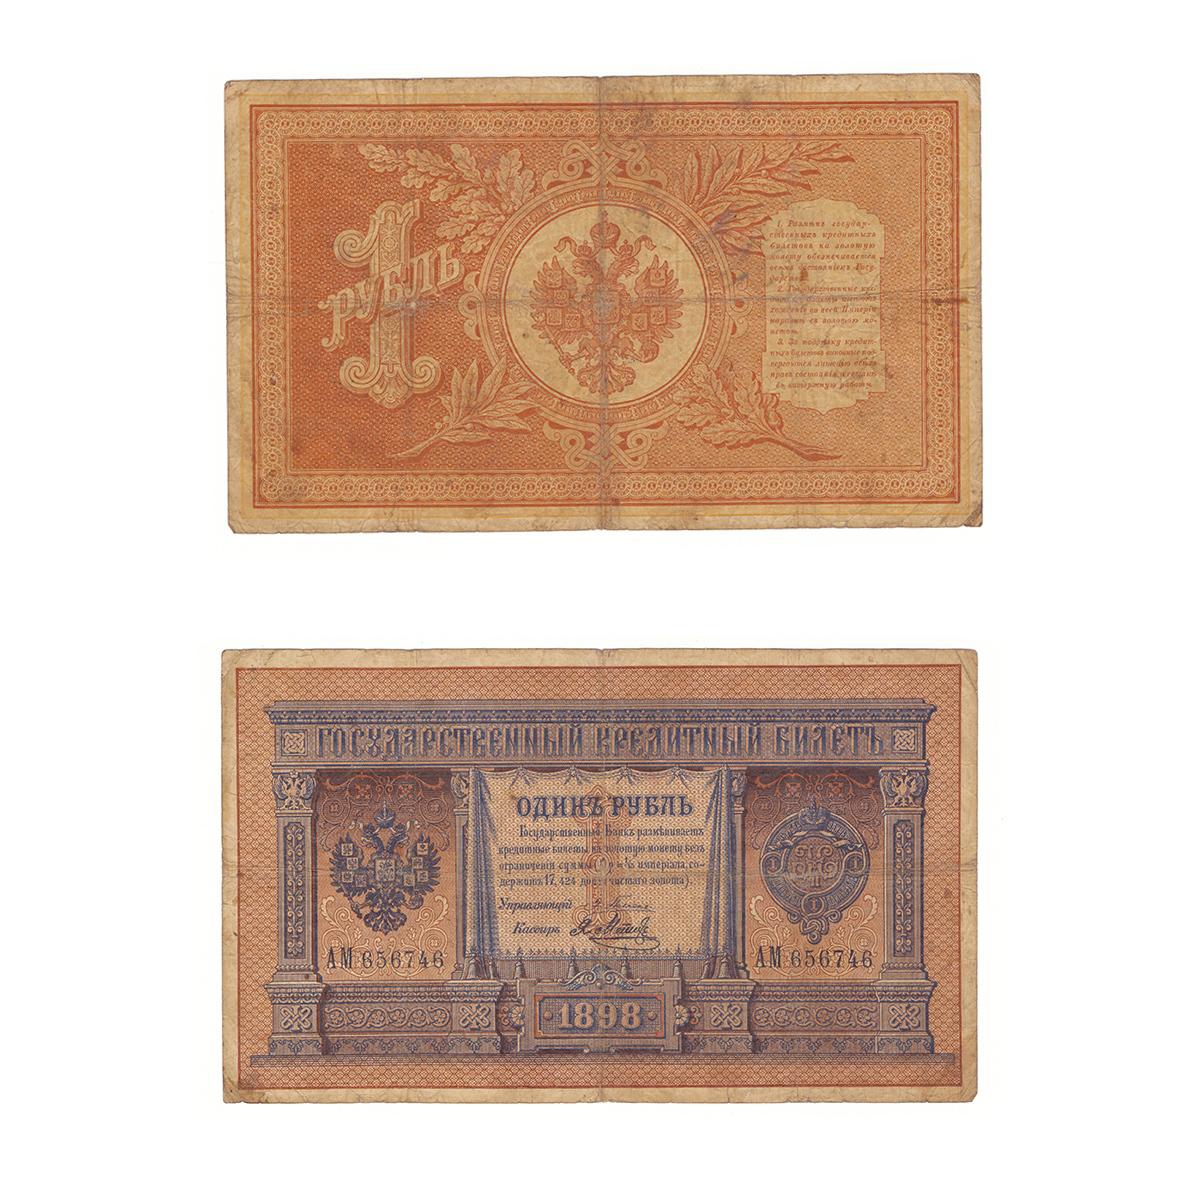 Кредитный билет 1 рубль 1898 Плеске Я.Метц (серия АМ 656746 ) VF